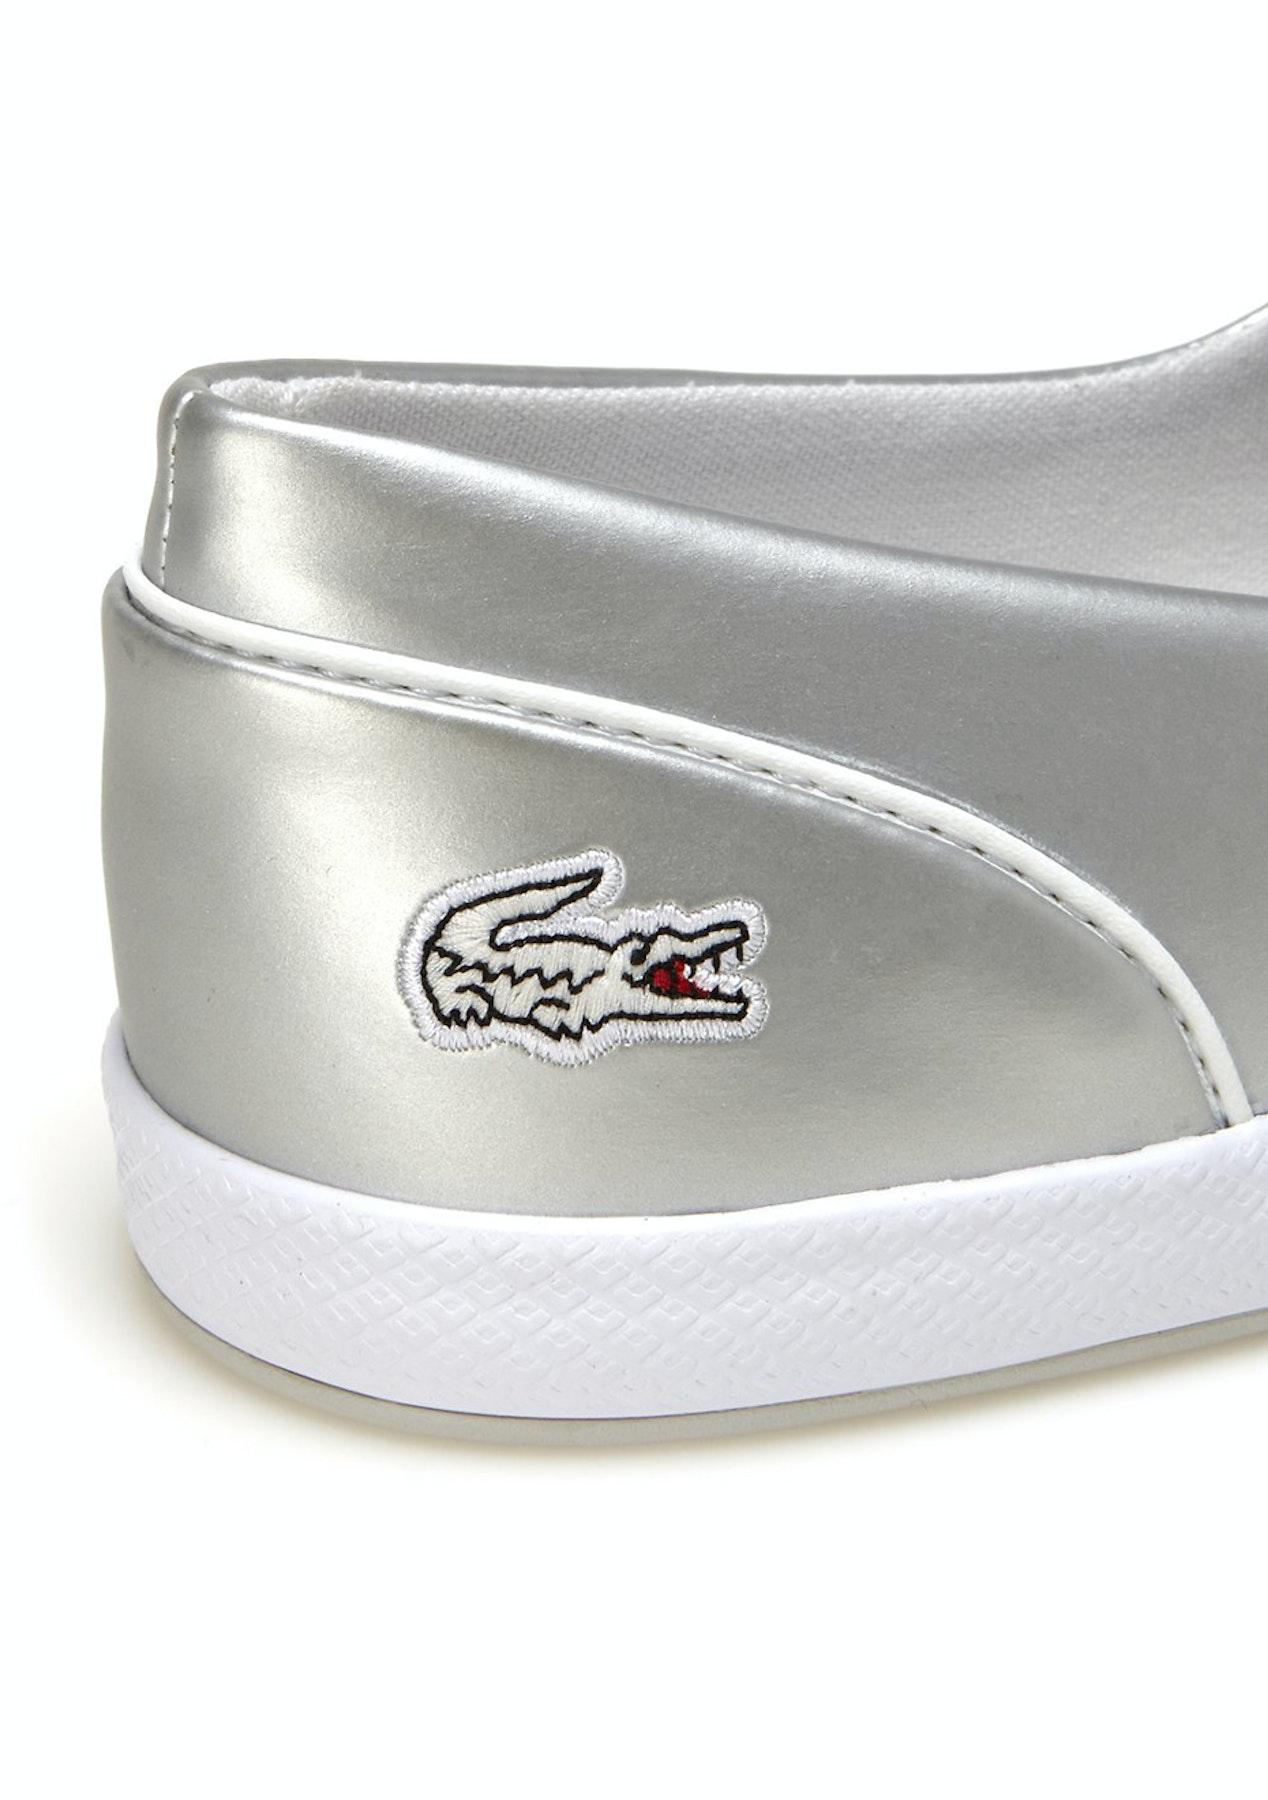 32253383c707 Lacoste - Womens Lancelle 3 Eye 117 1 Light Grey - Footwear Outlet - Onceit